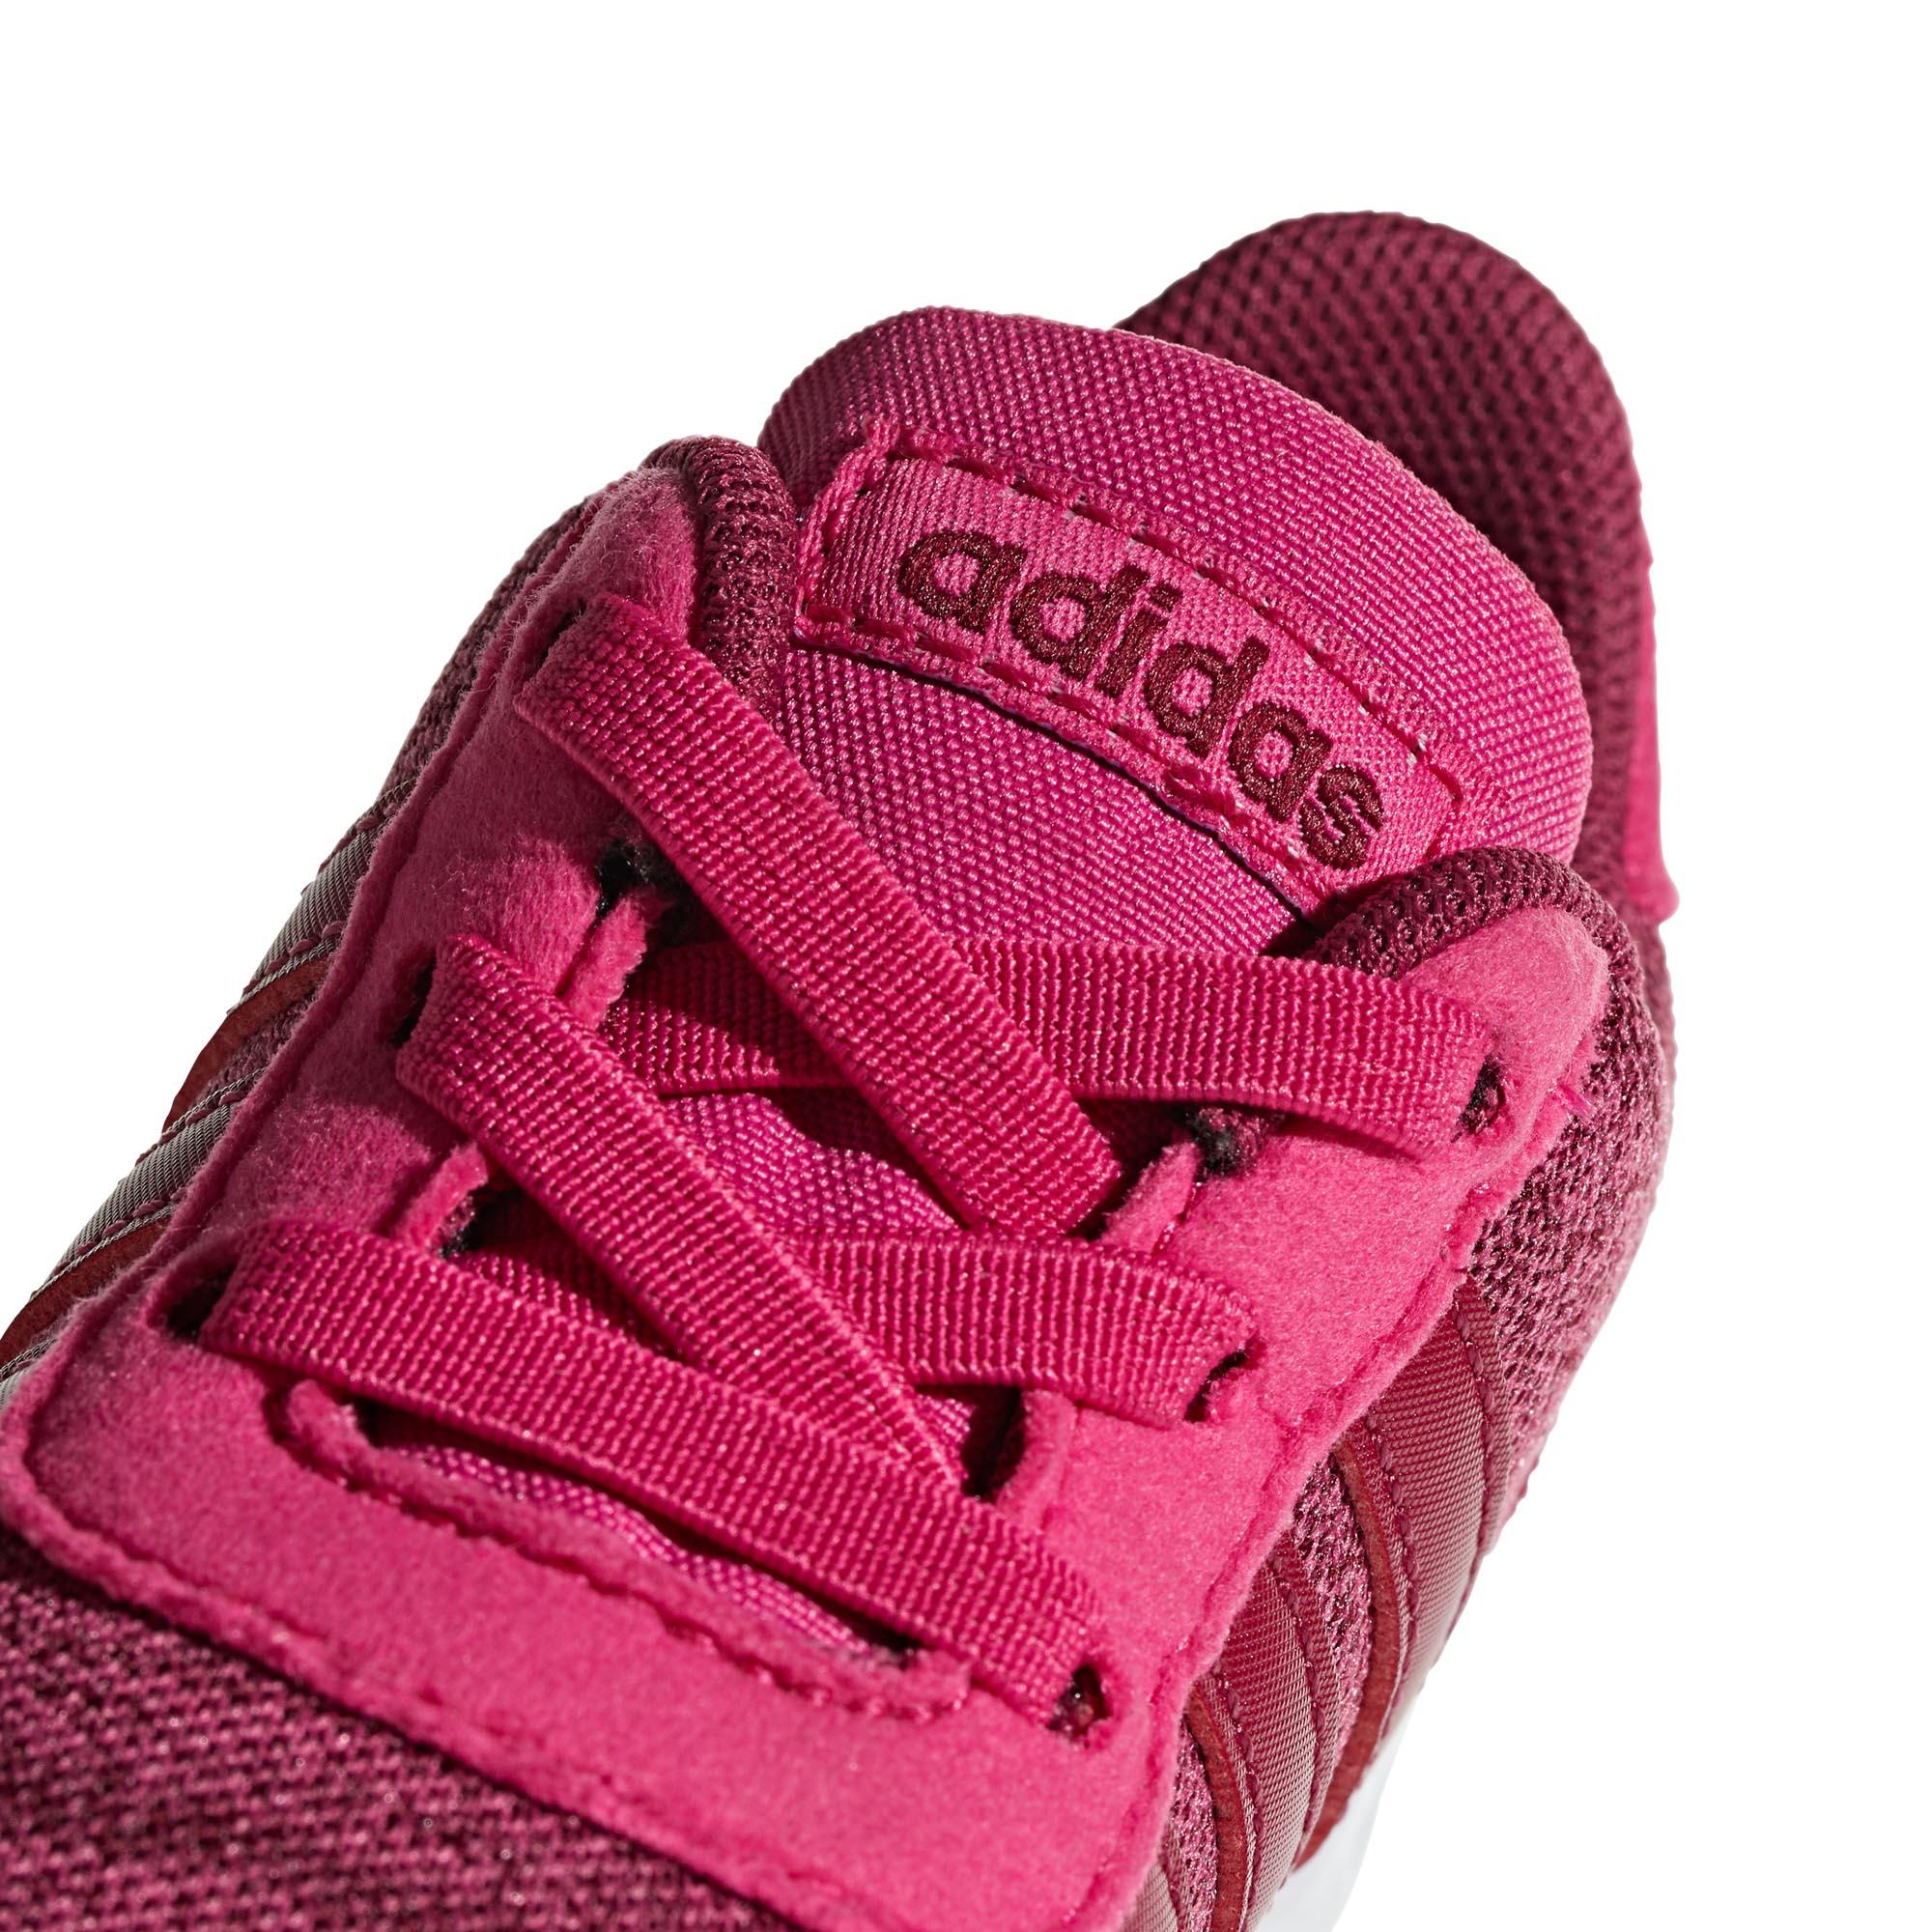 Détails sur Adidas Lite Coureur Enfant Enfants Filles Sports Baskets Magenta Rose UK 6